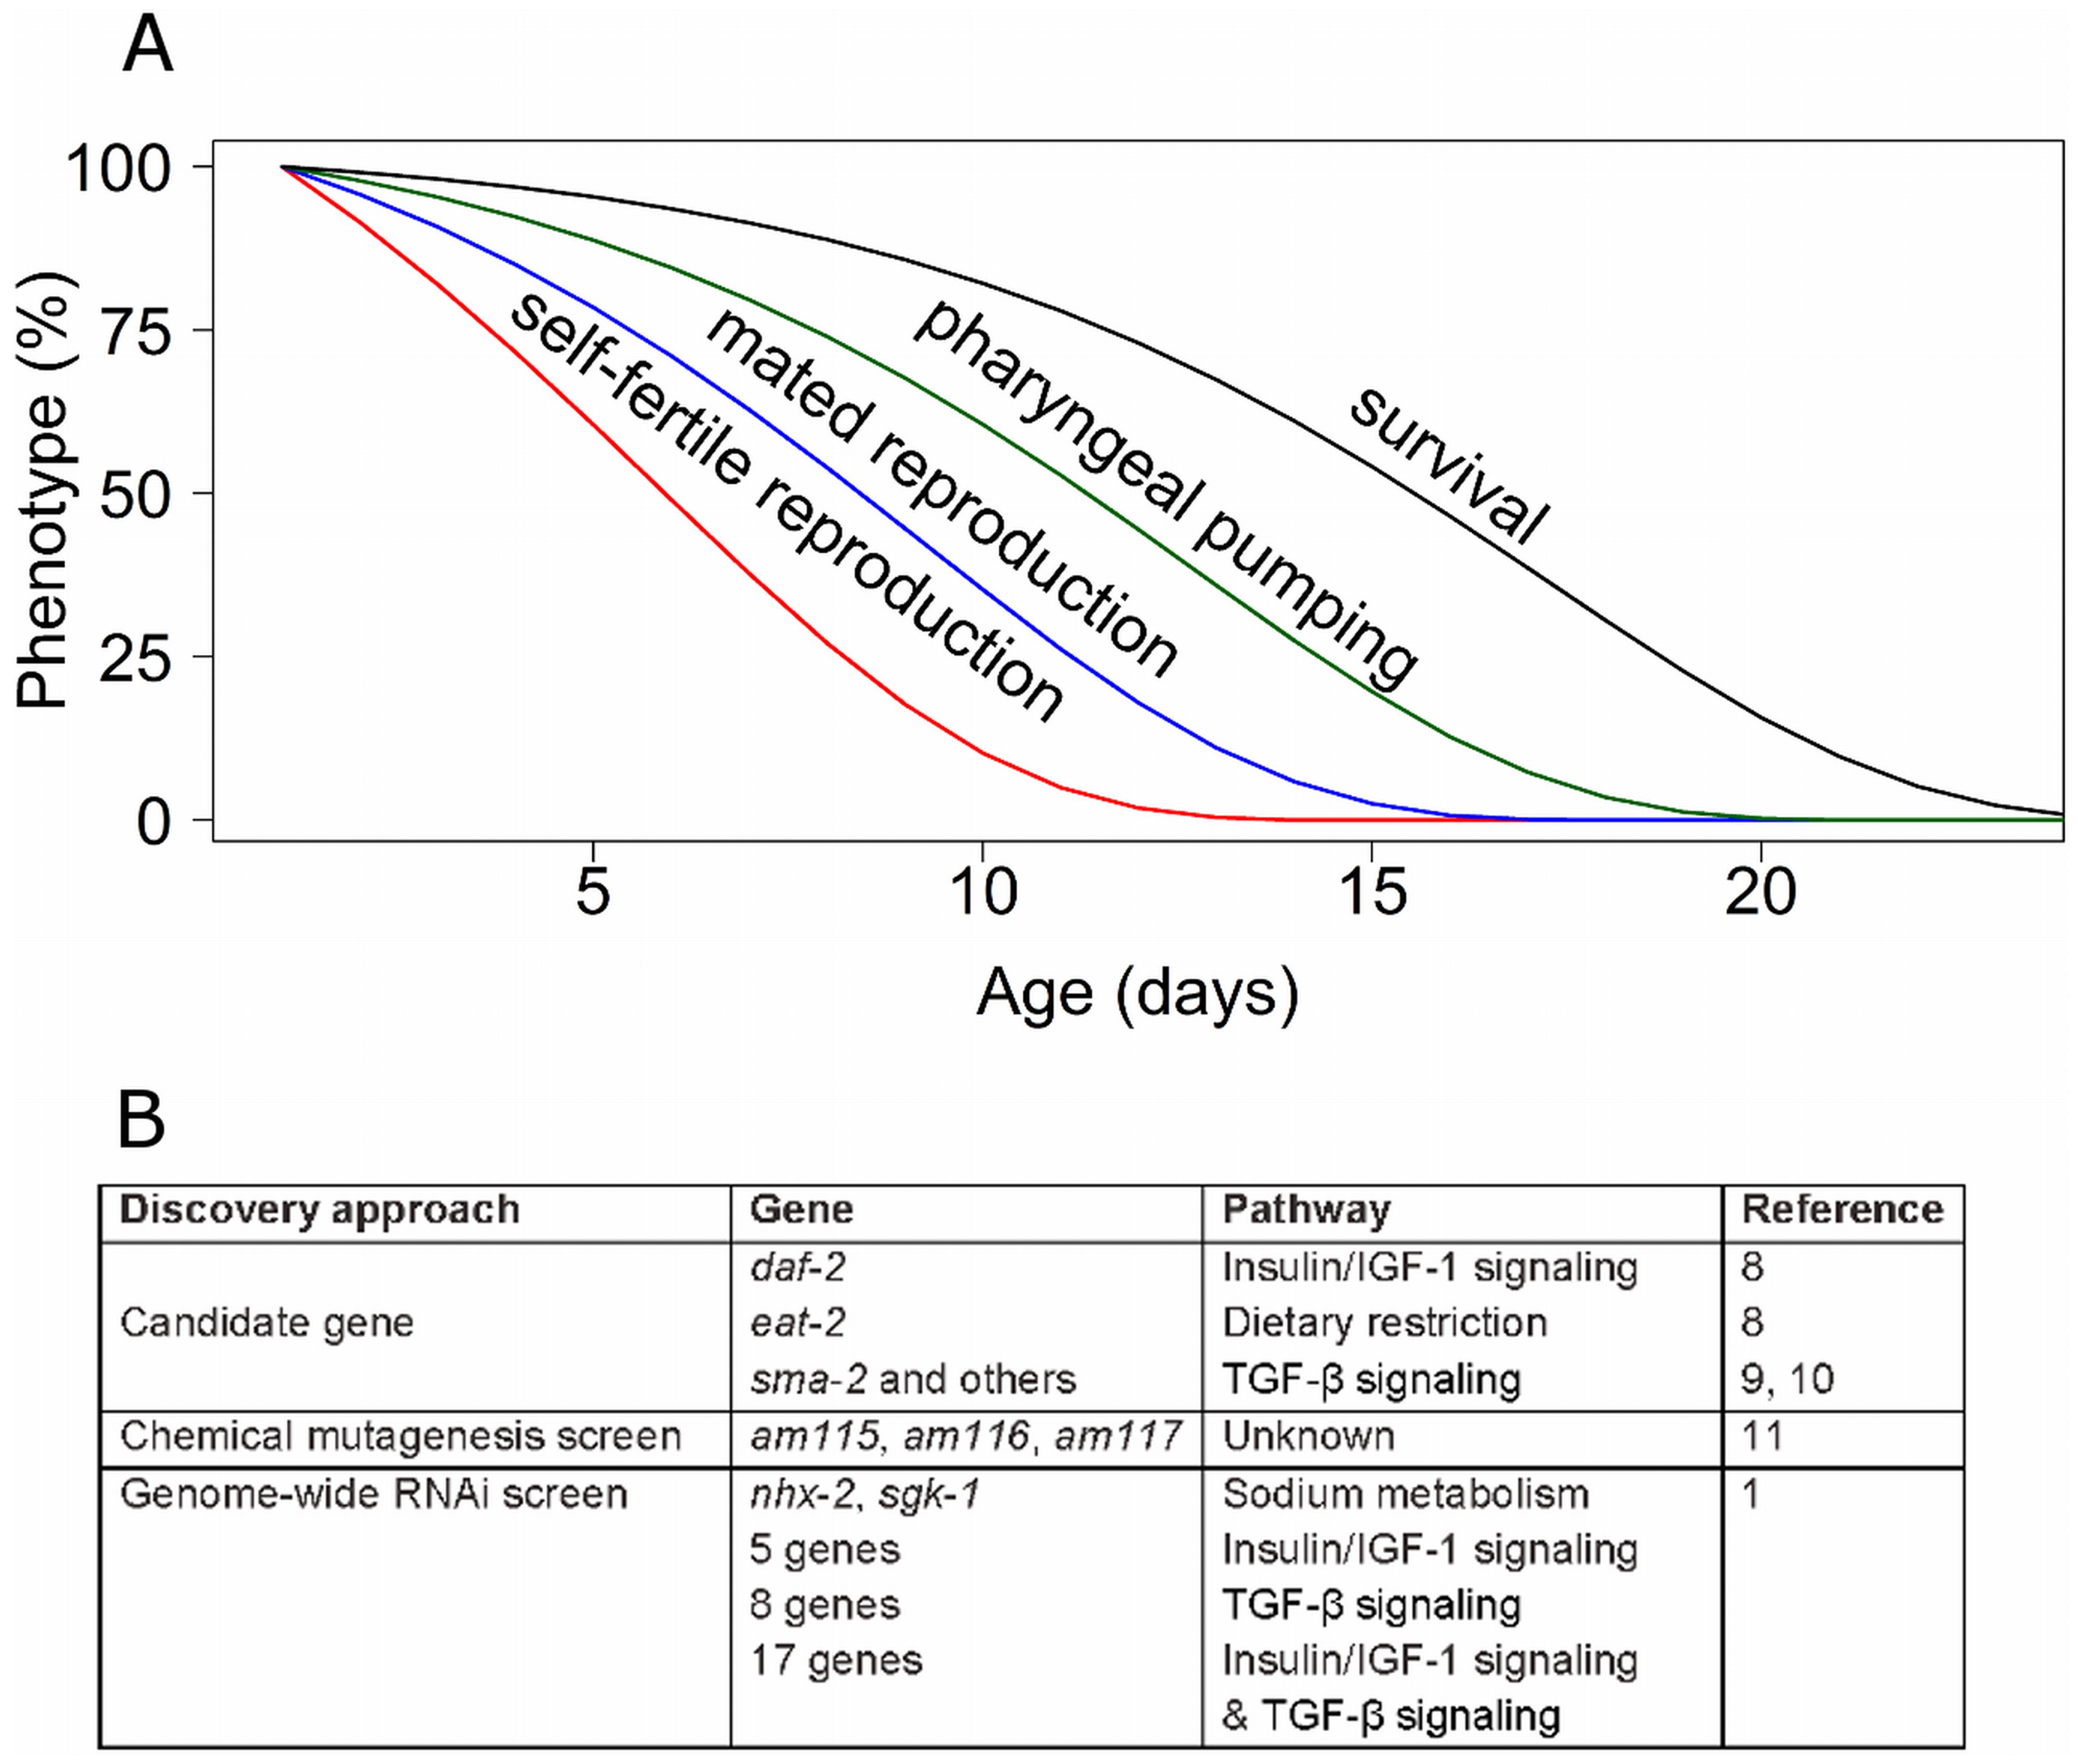 Genetic analysis of reproductive aging in <i>C. elegans</i>.